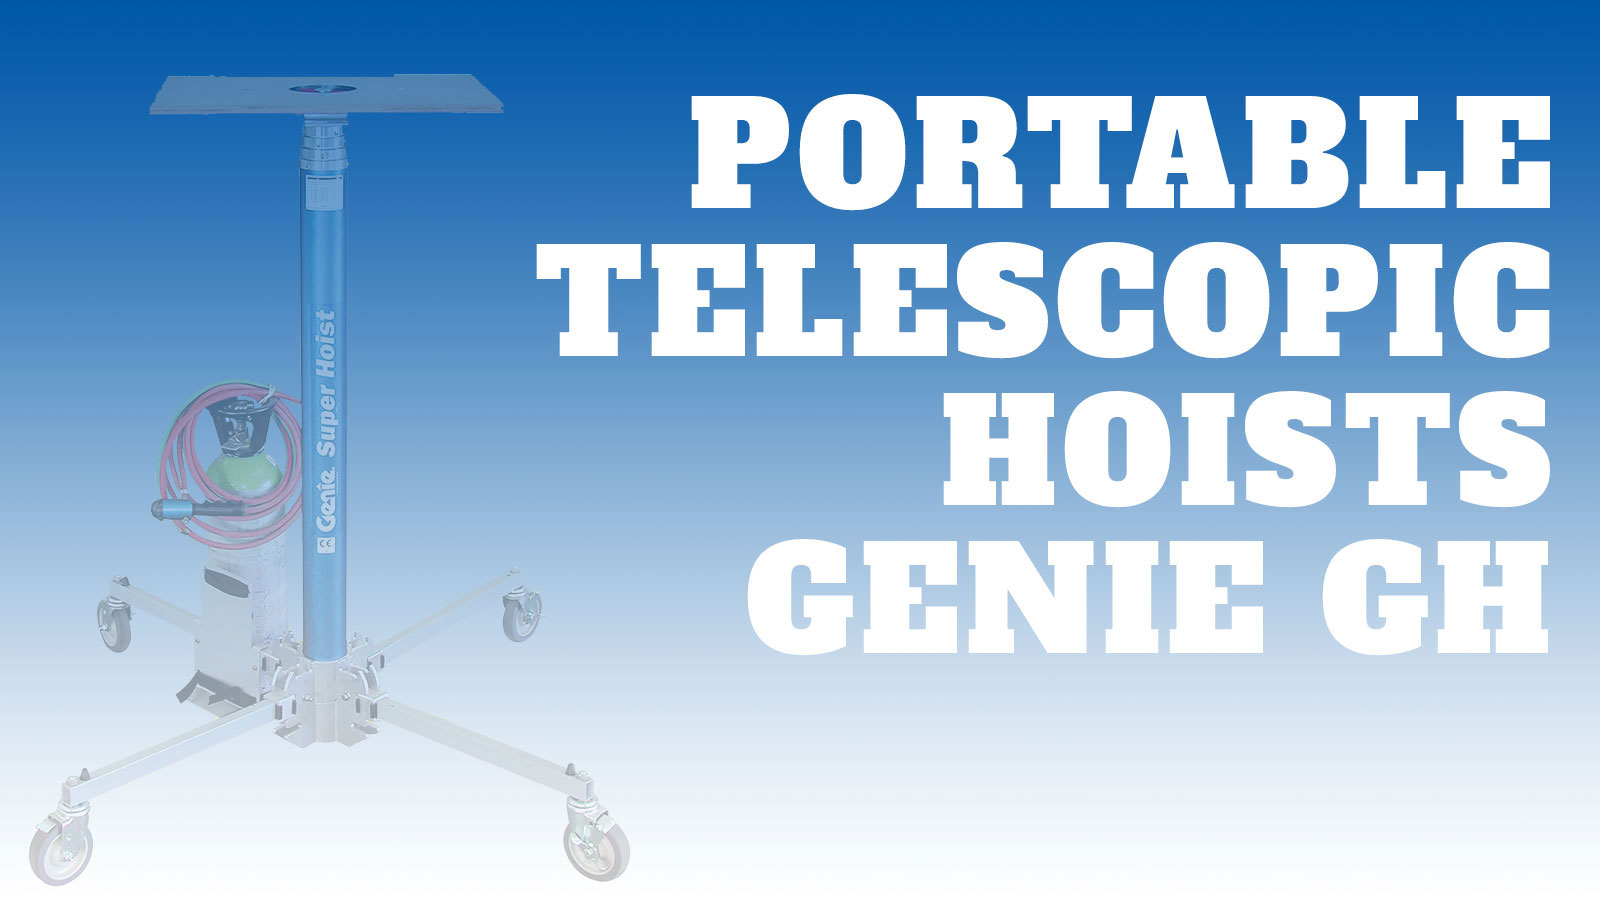 Lifting-Portable-Telescopic Hoists